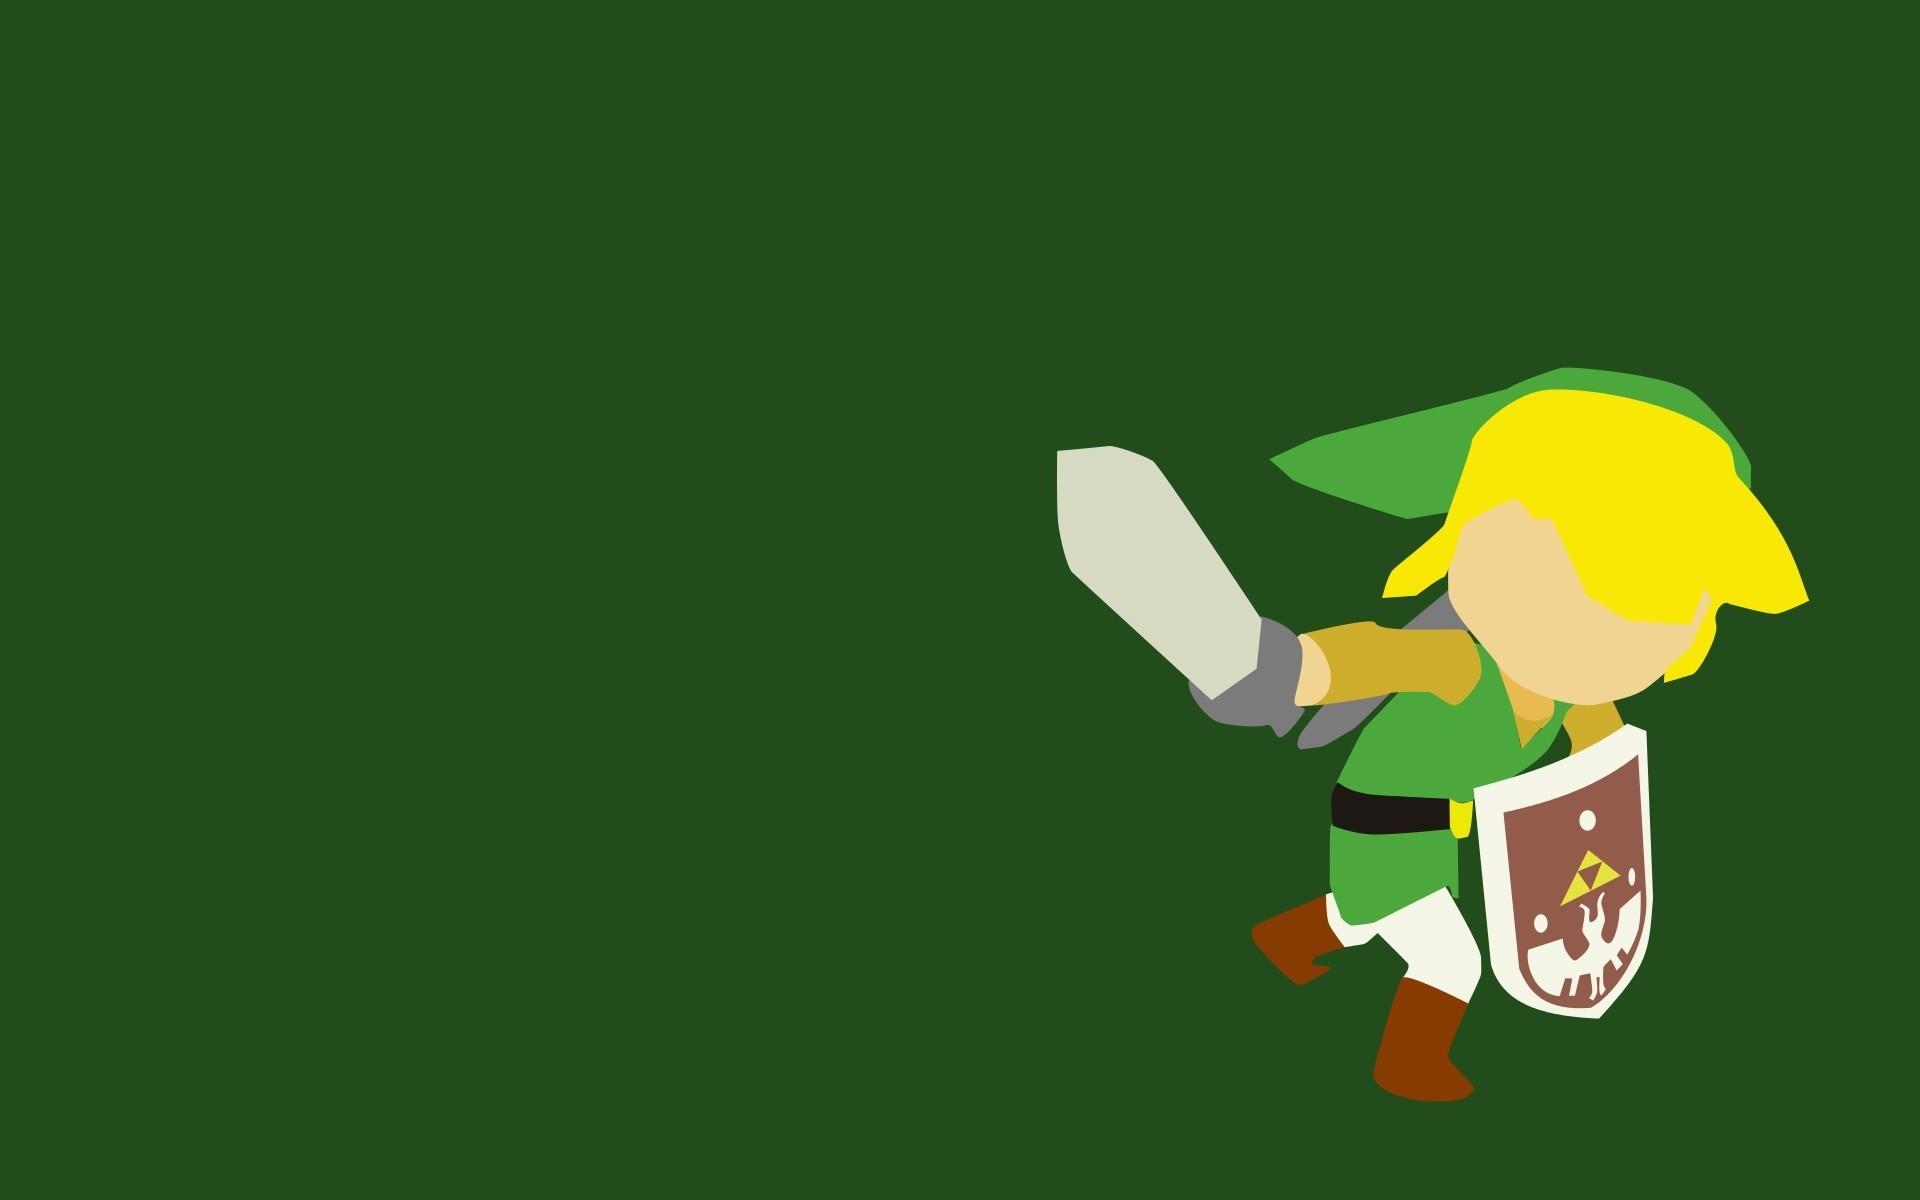 Link, The Legend Of Zelda, Minimalism, Video Games Wallpapers HD / Desktop  and Mobile Backgrounds